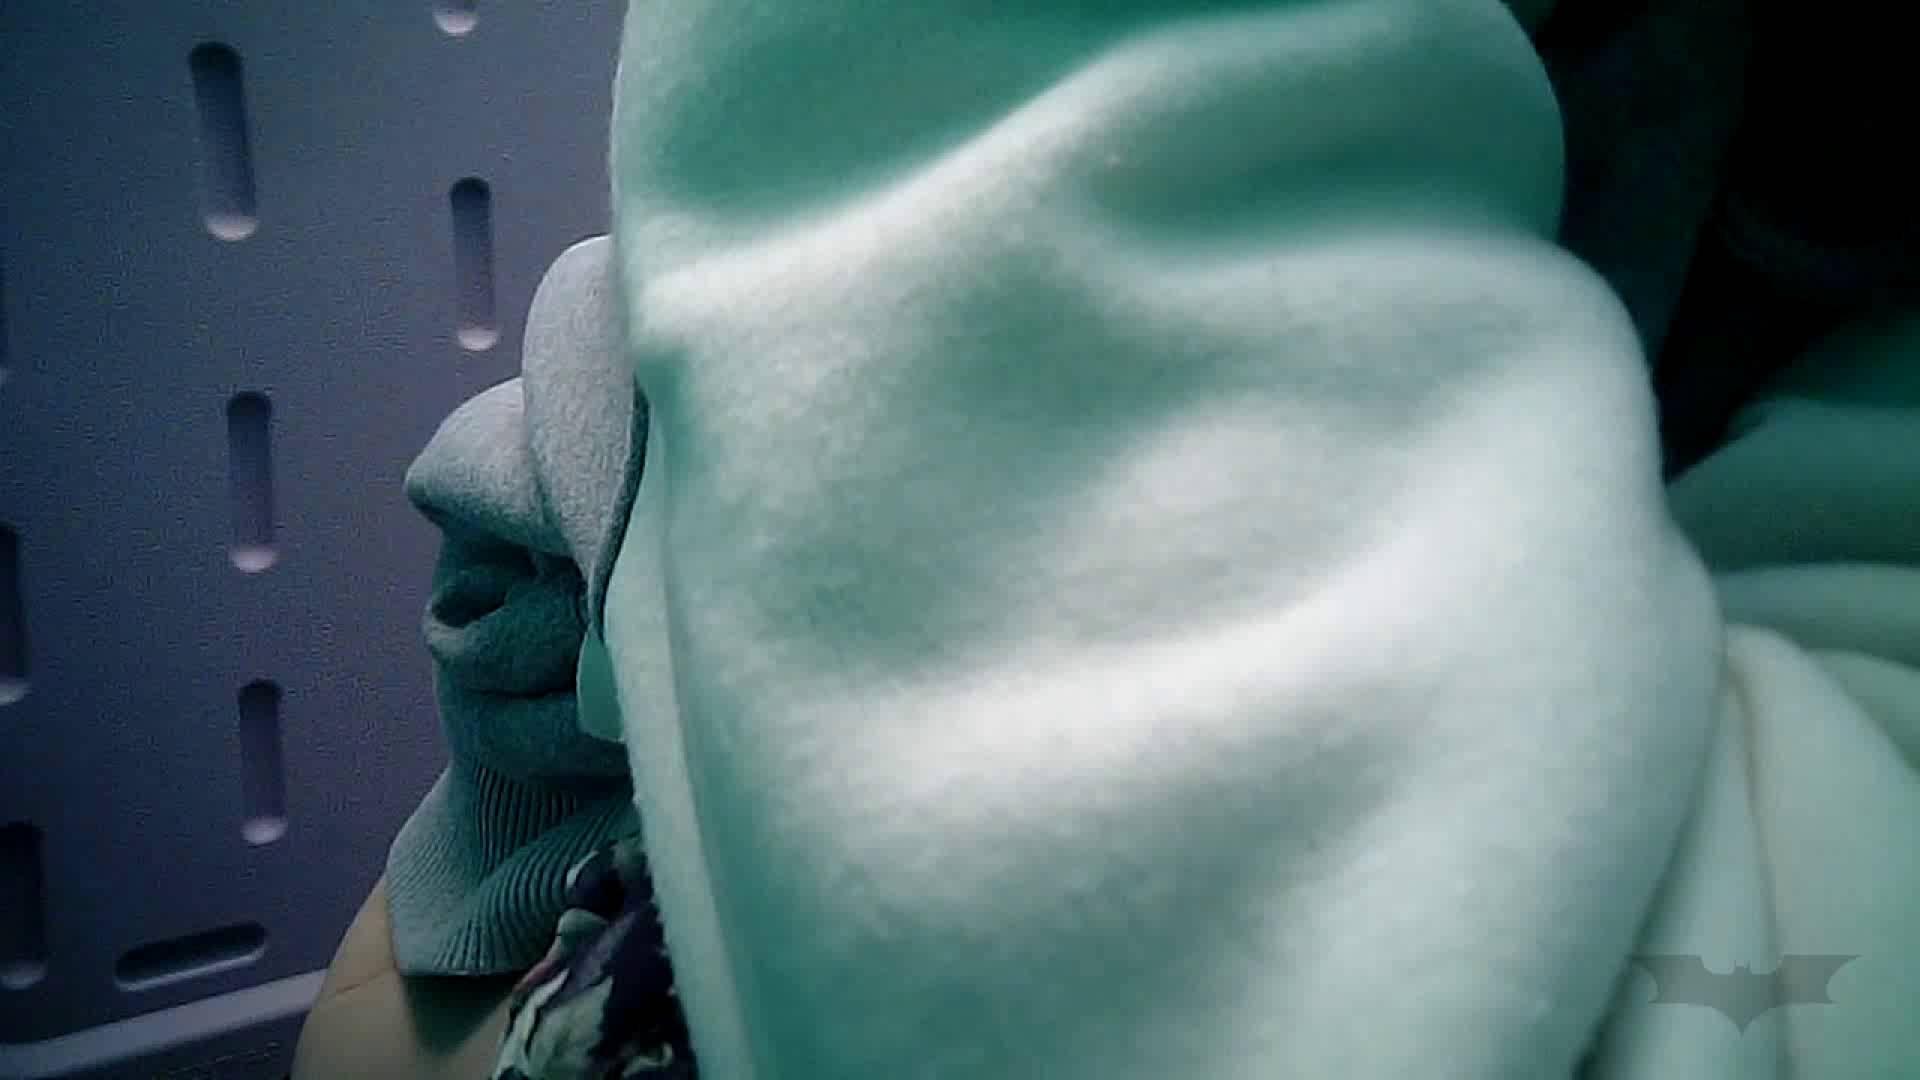 痴態洗面所 Vol.09 美女系、清楚系、ギャル系、時々祭り系?? 洗面所  66pic 45